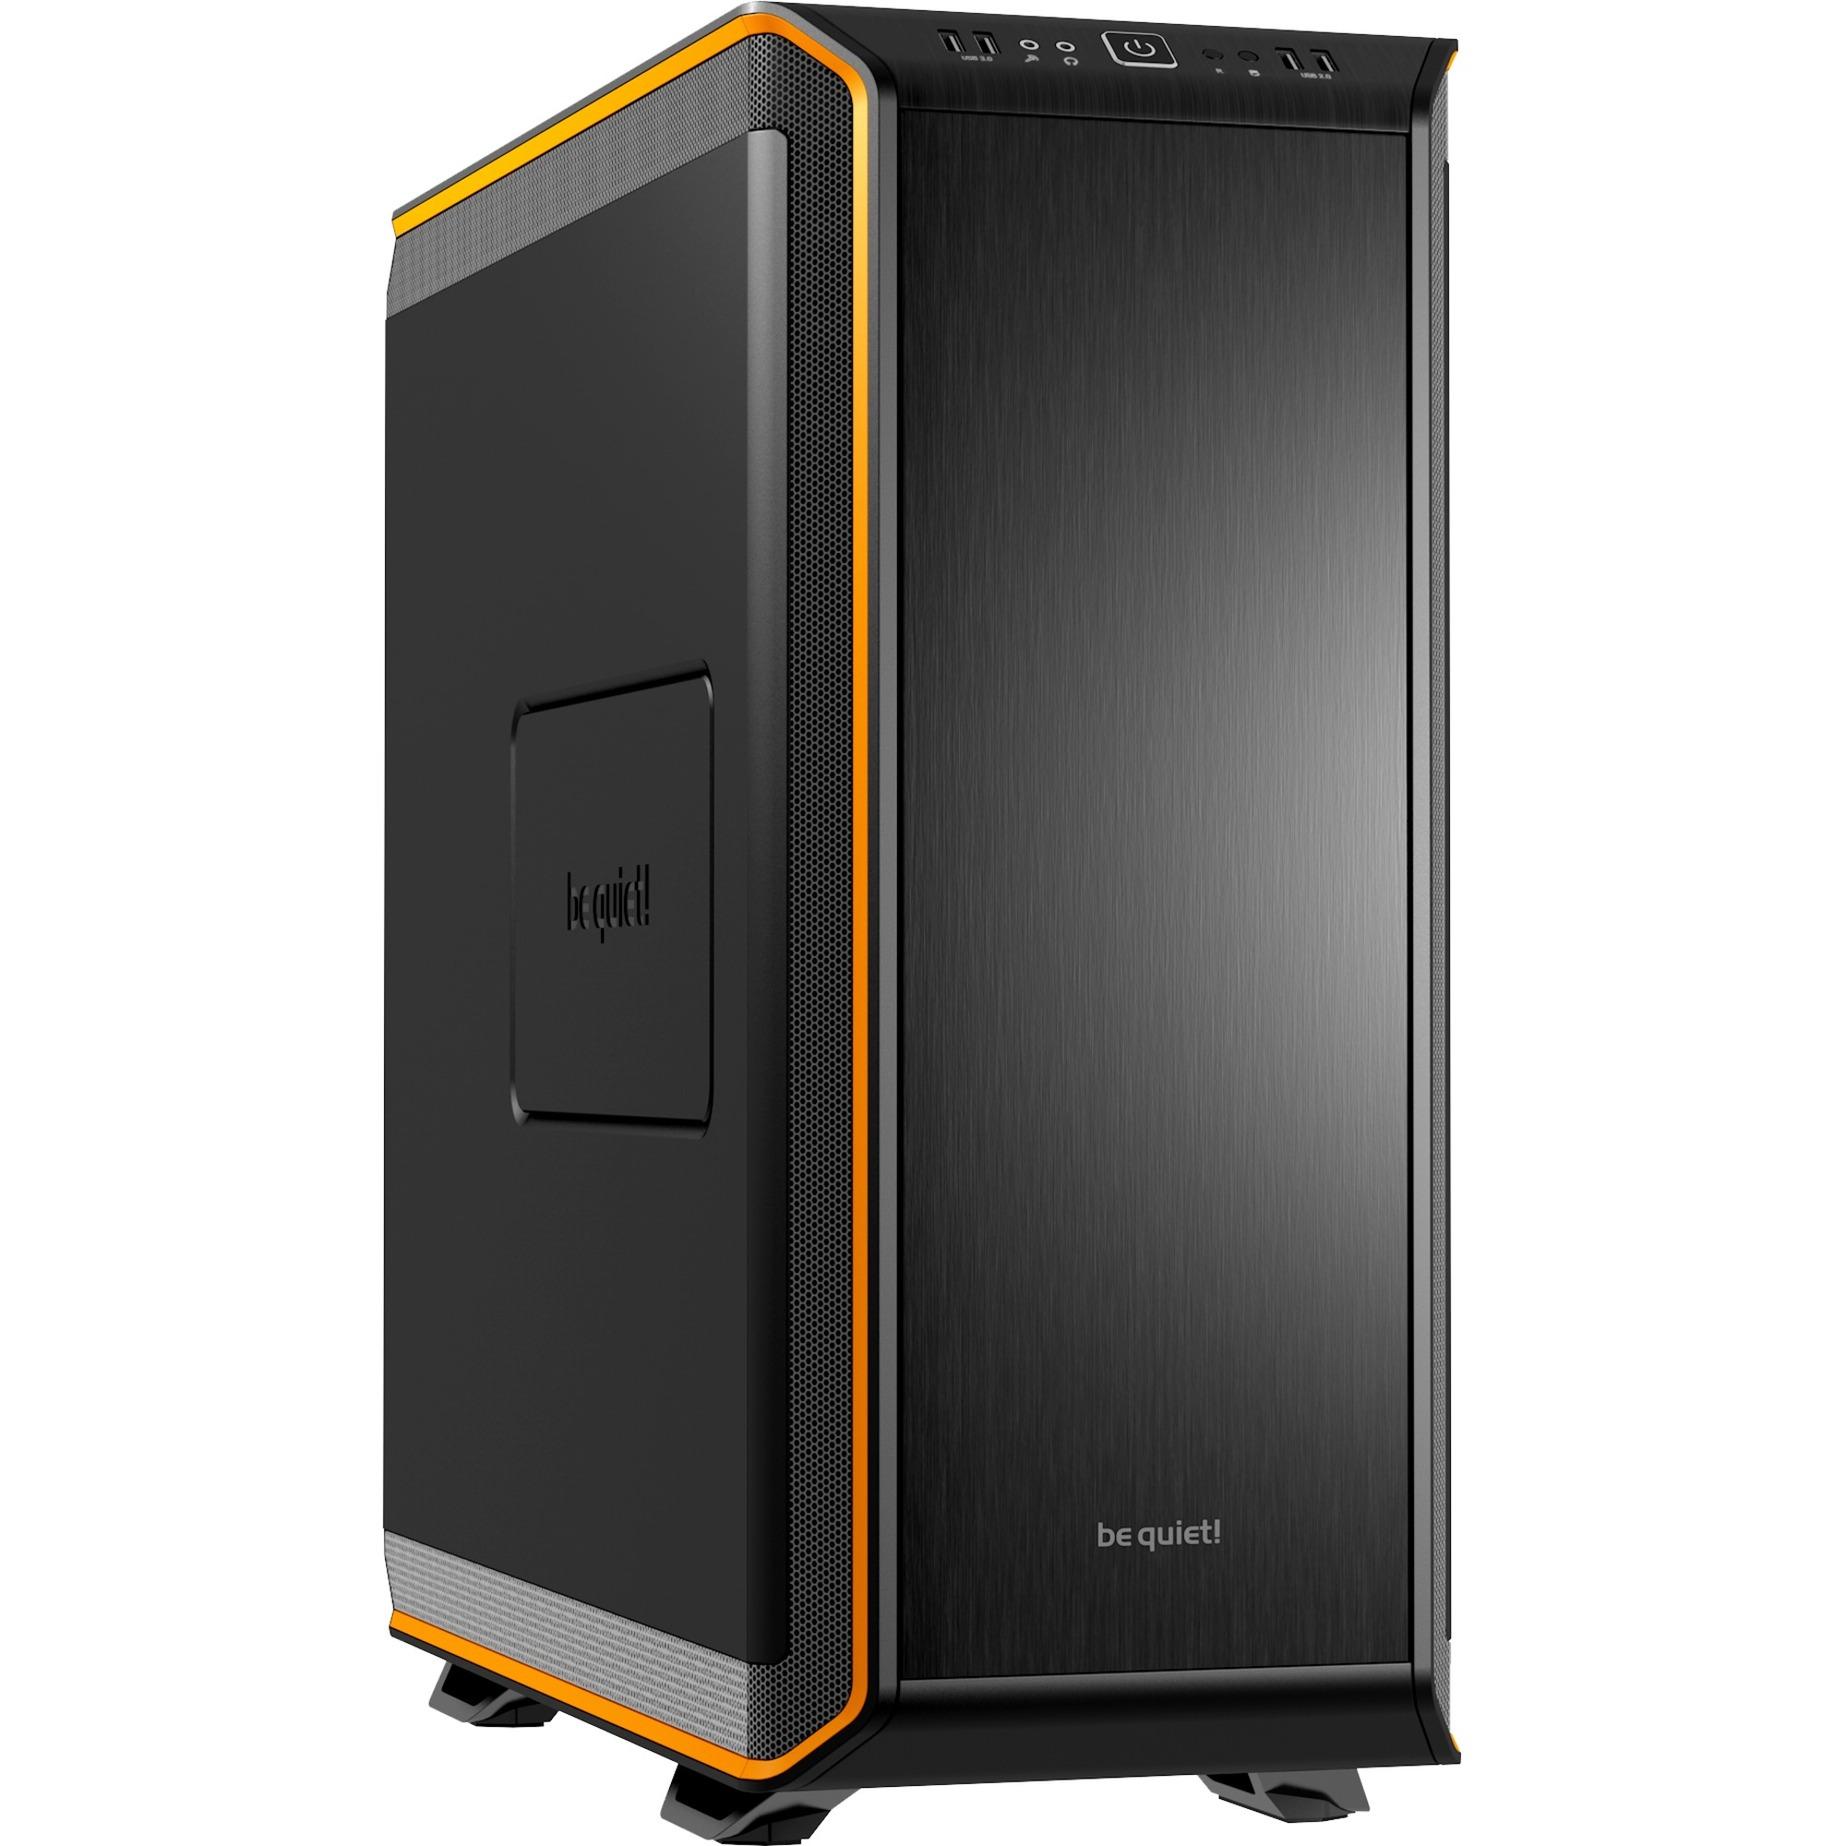 Dark Base 900 Escritorio Negro, Naranja carcasa de ordenador, Caja de torre grande